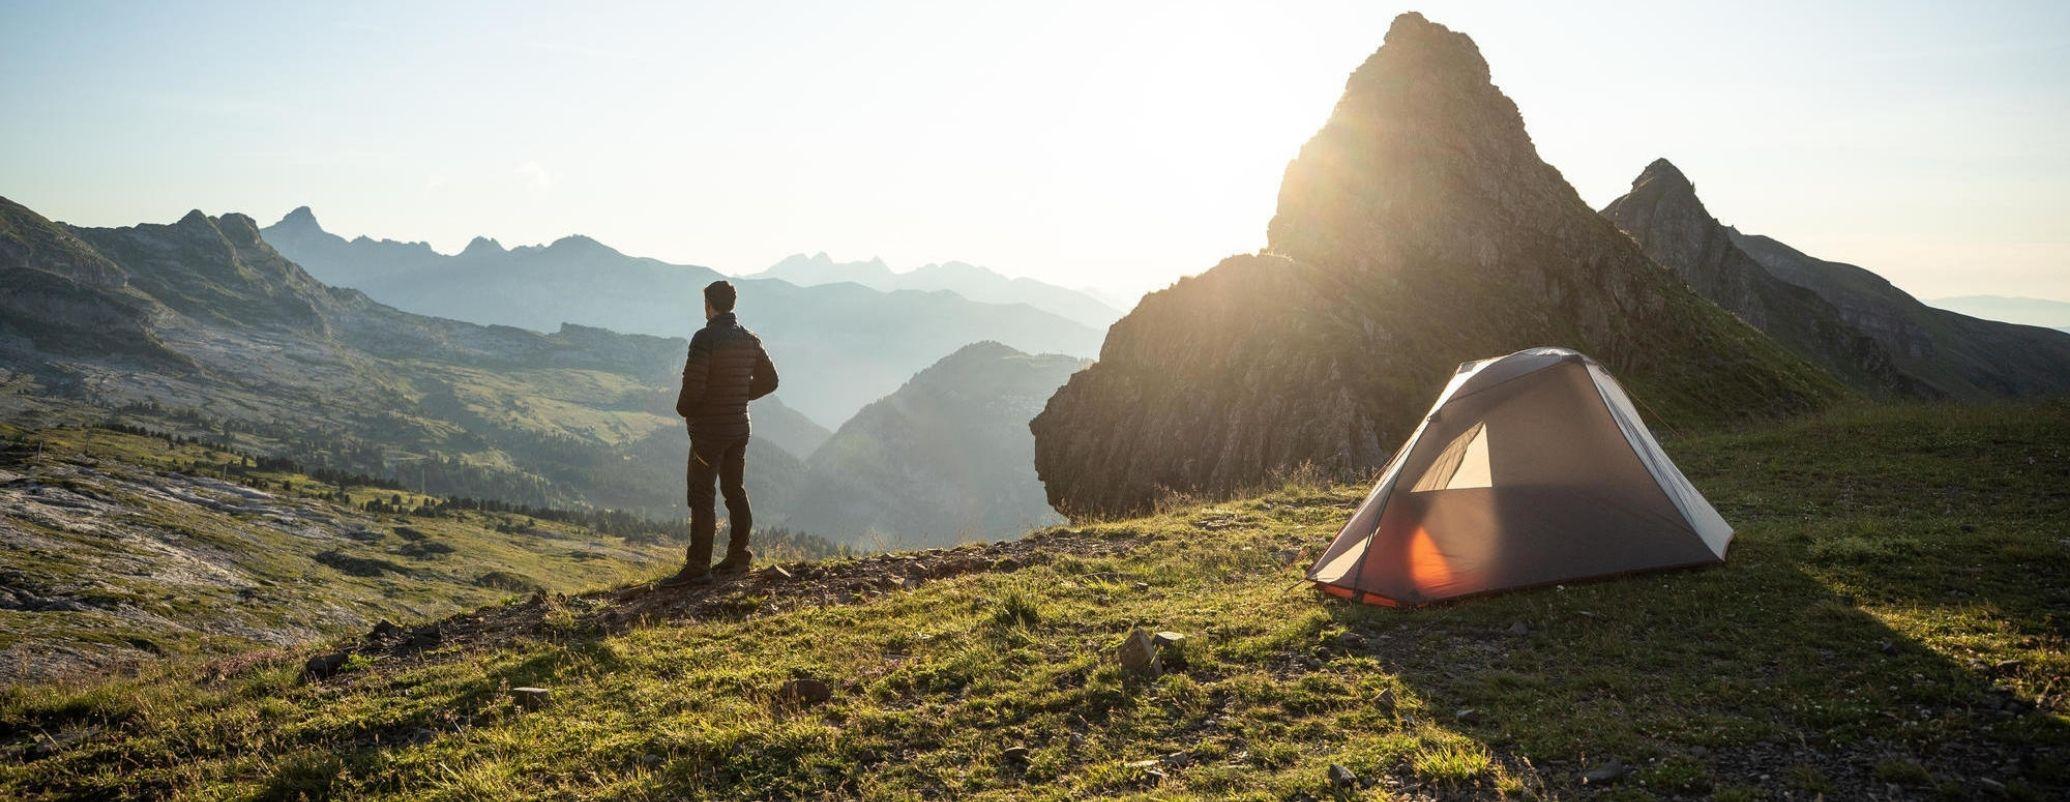 MARQUE COVER FORCLAZ Trekking Bivouac